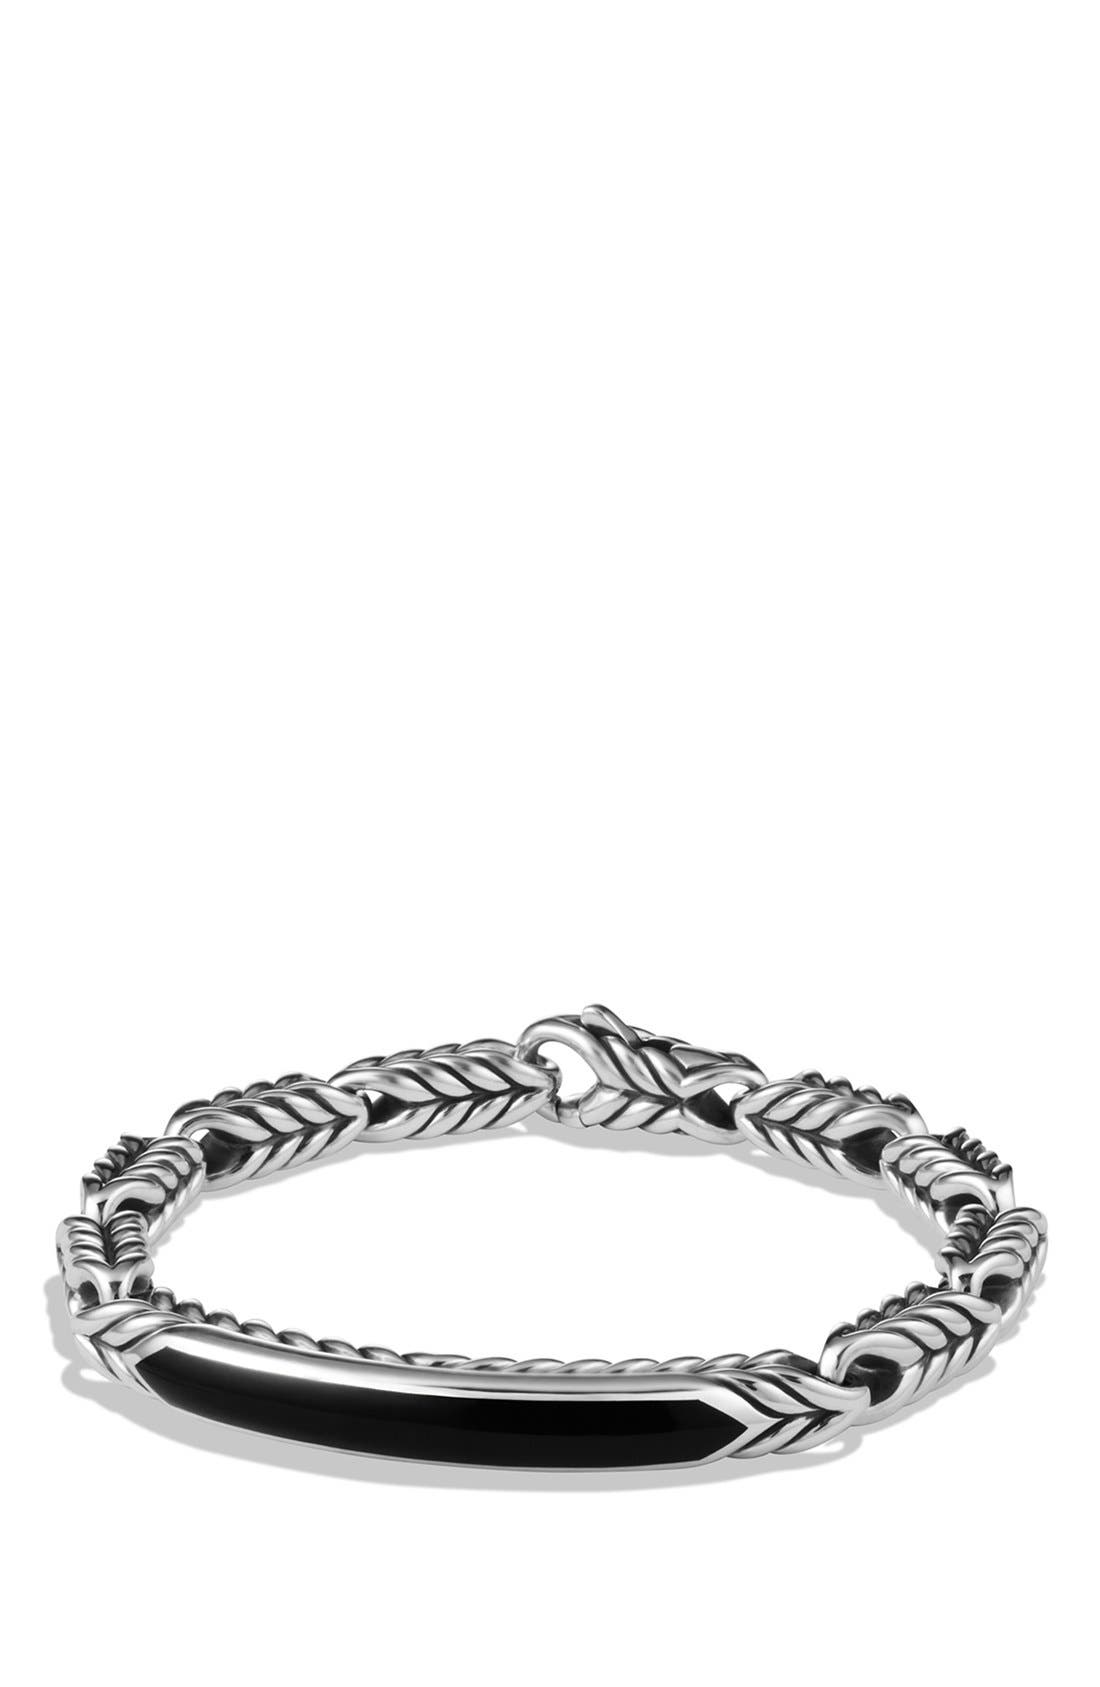 David Yurman 'Chevron' ID Bracelet